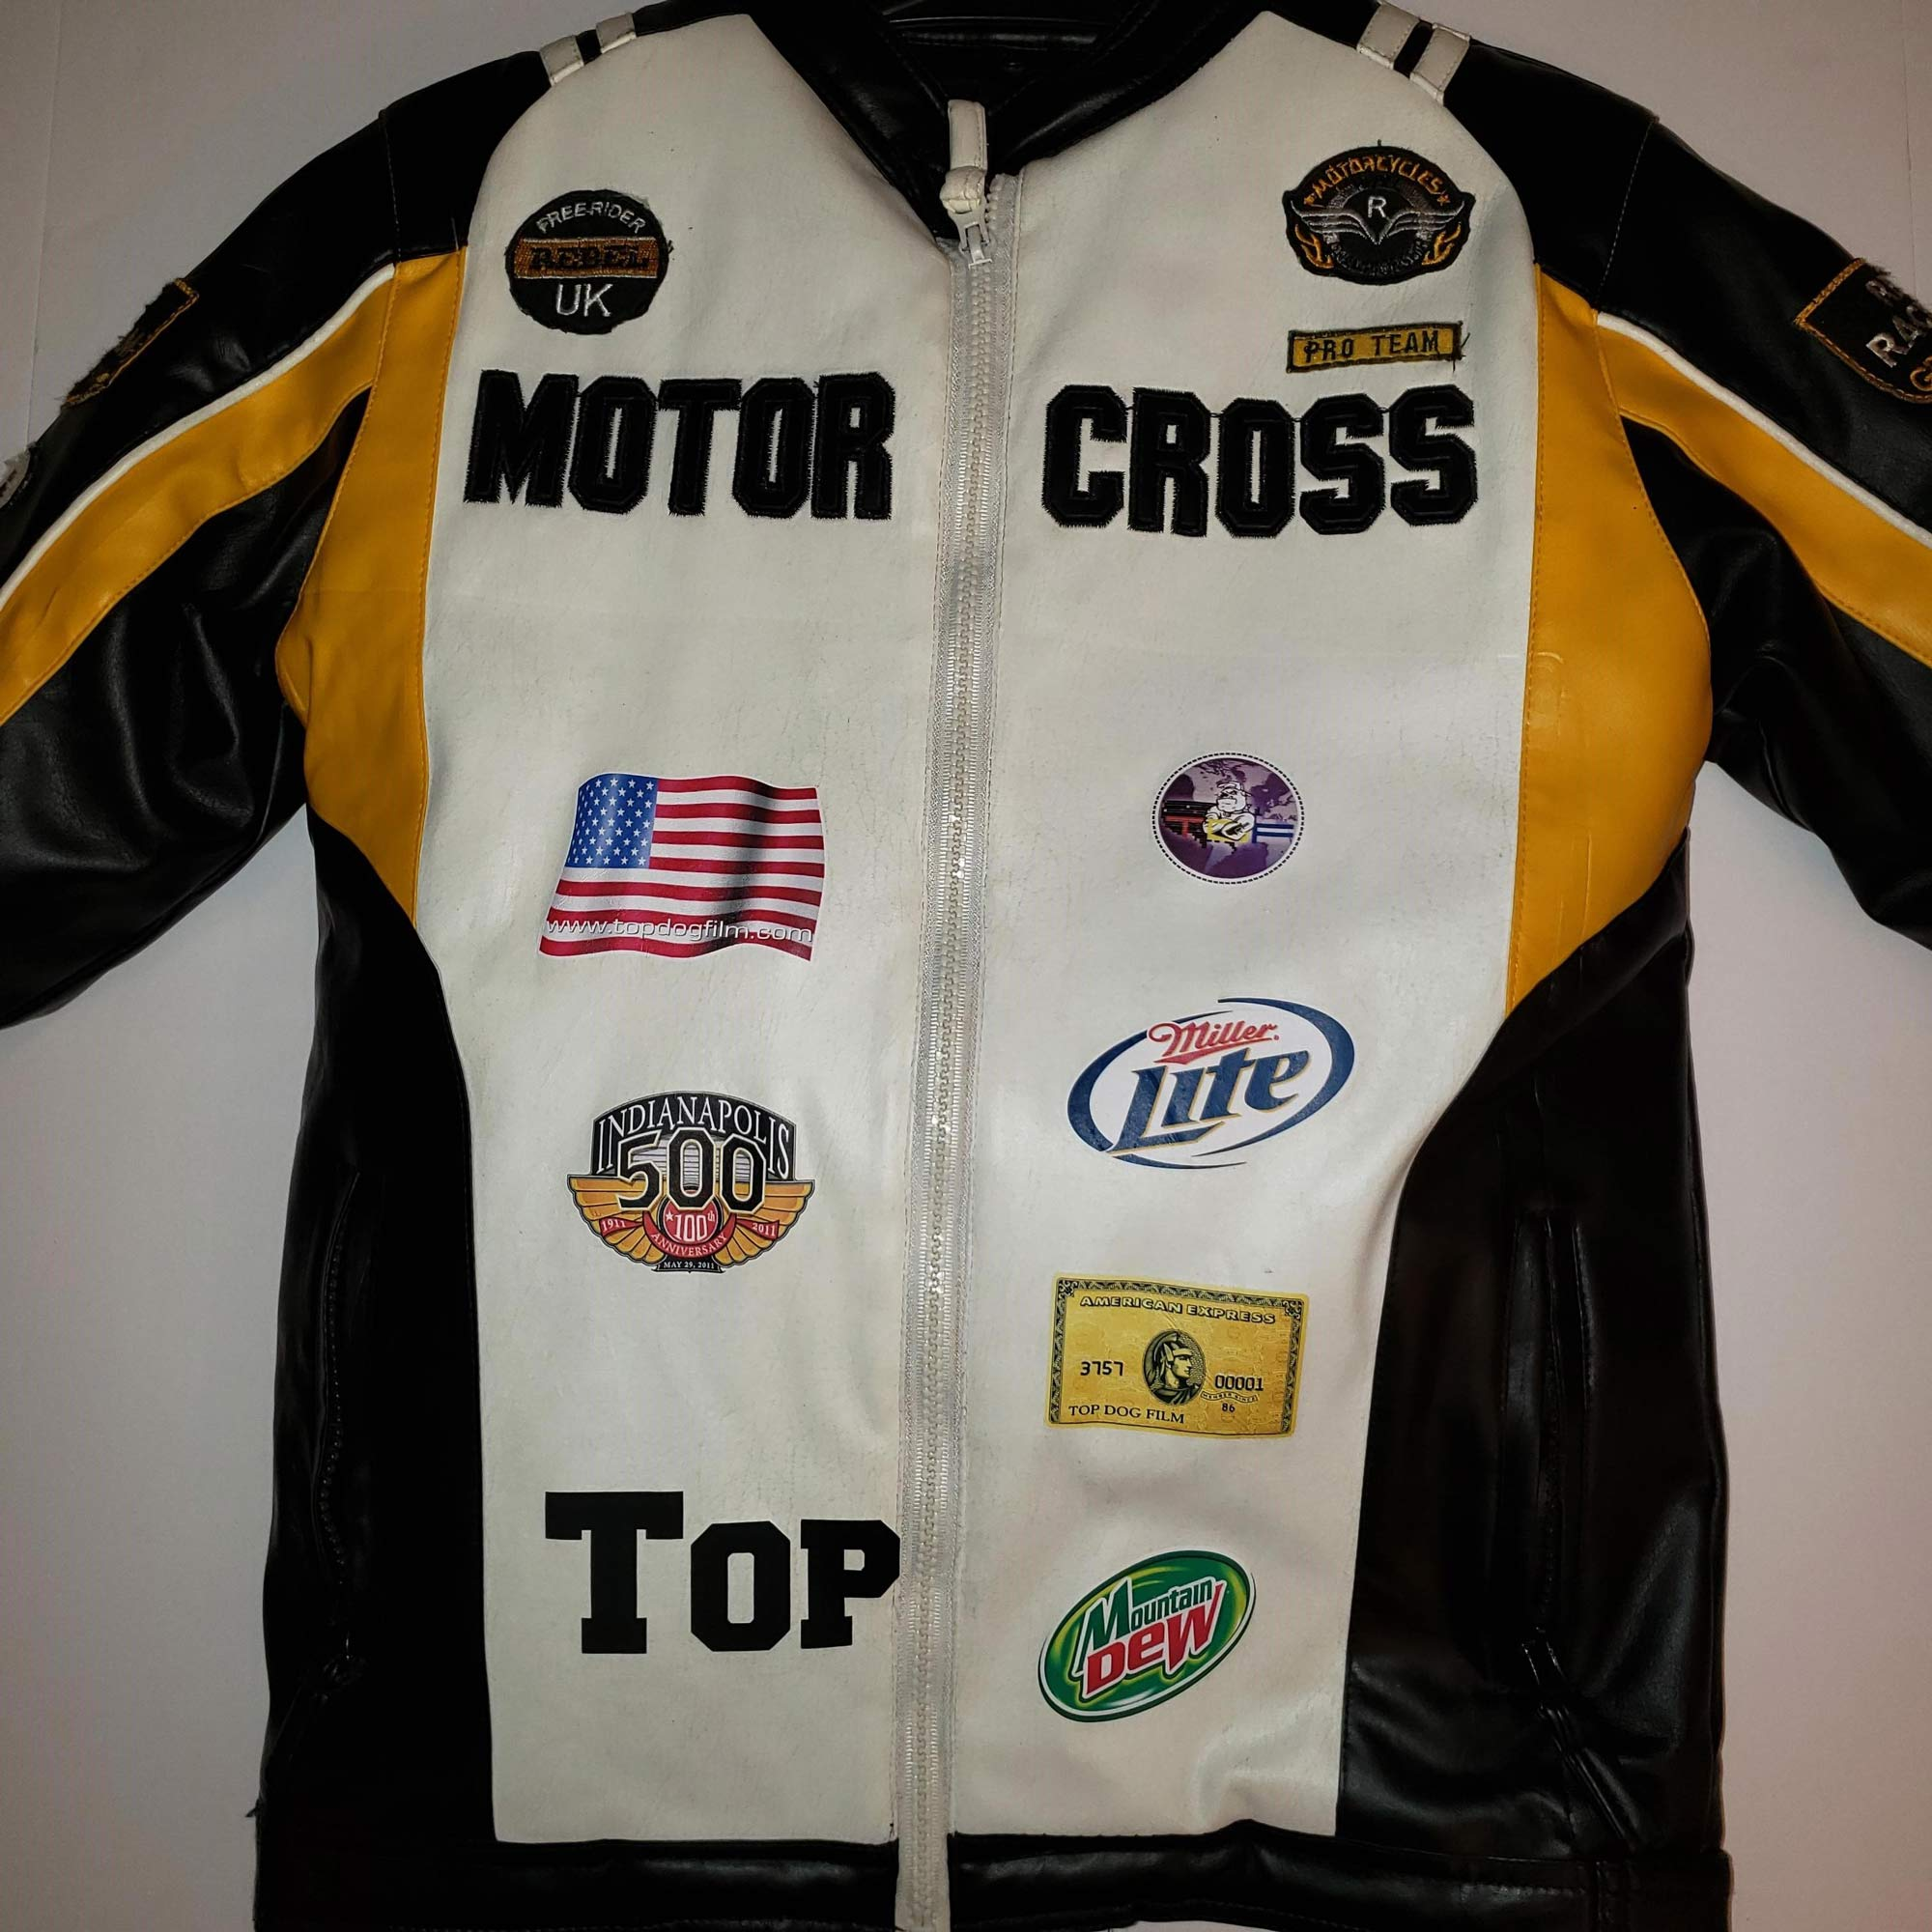 Promo-7-leather-jacket-WIZ-KUT-and-PLatinum-Print-Opaque-e1582809454969b